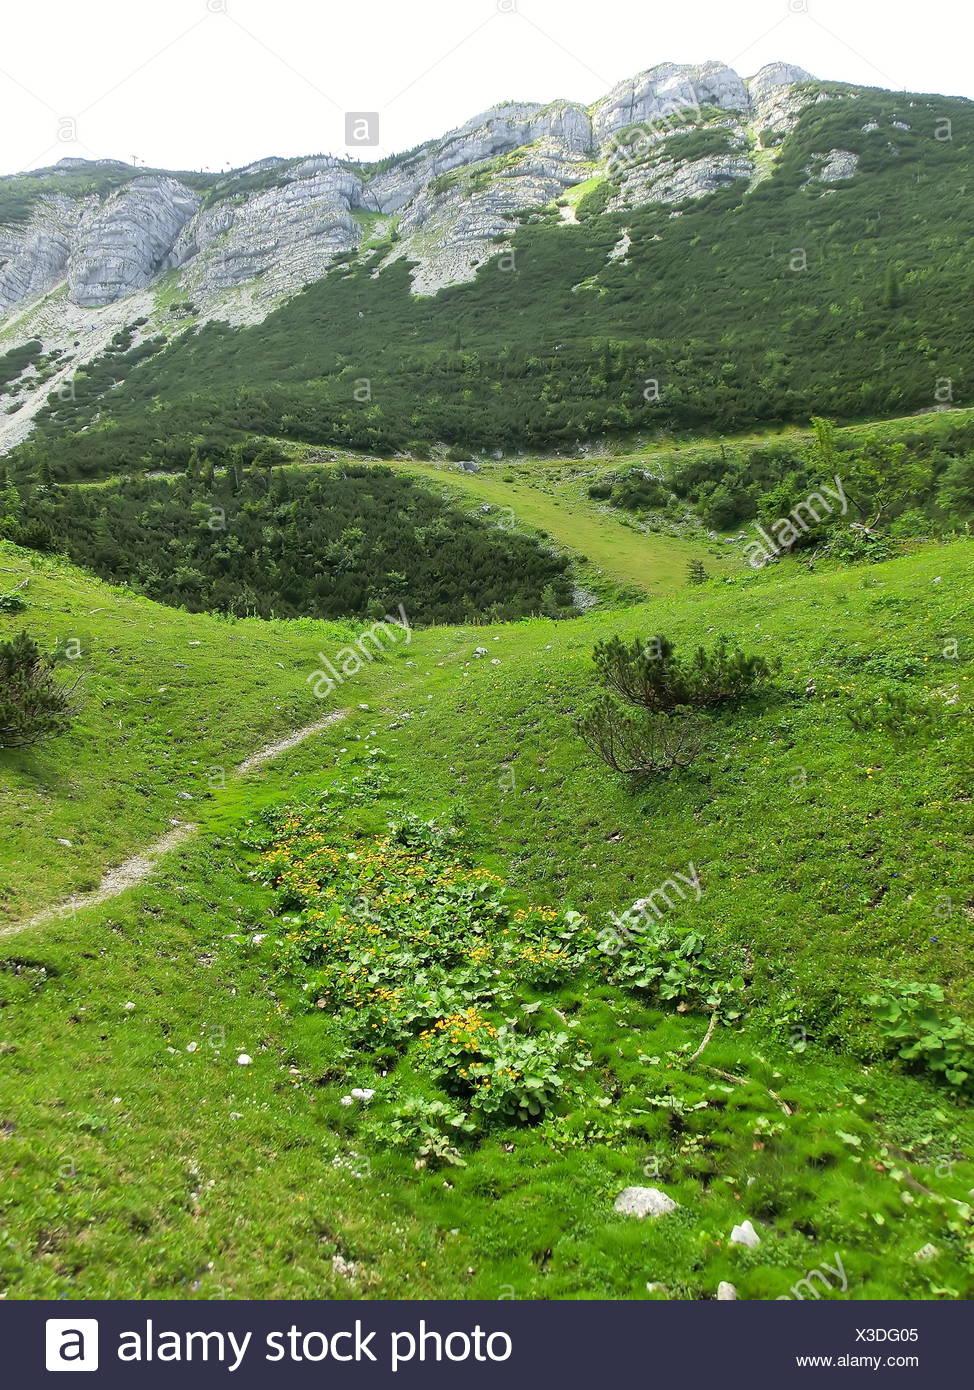 mountains, green, rock, lower austria, meadow, mountain, grass, lawn, tree, Stock Photo